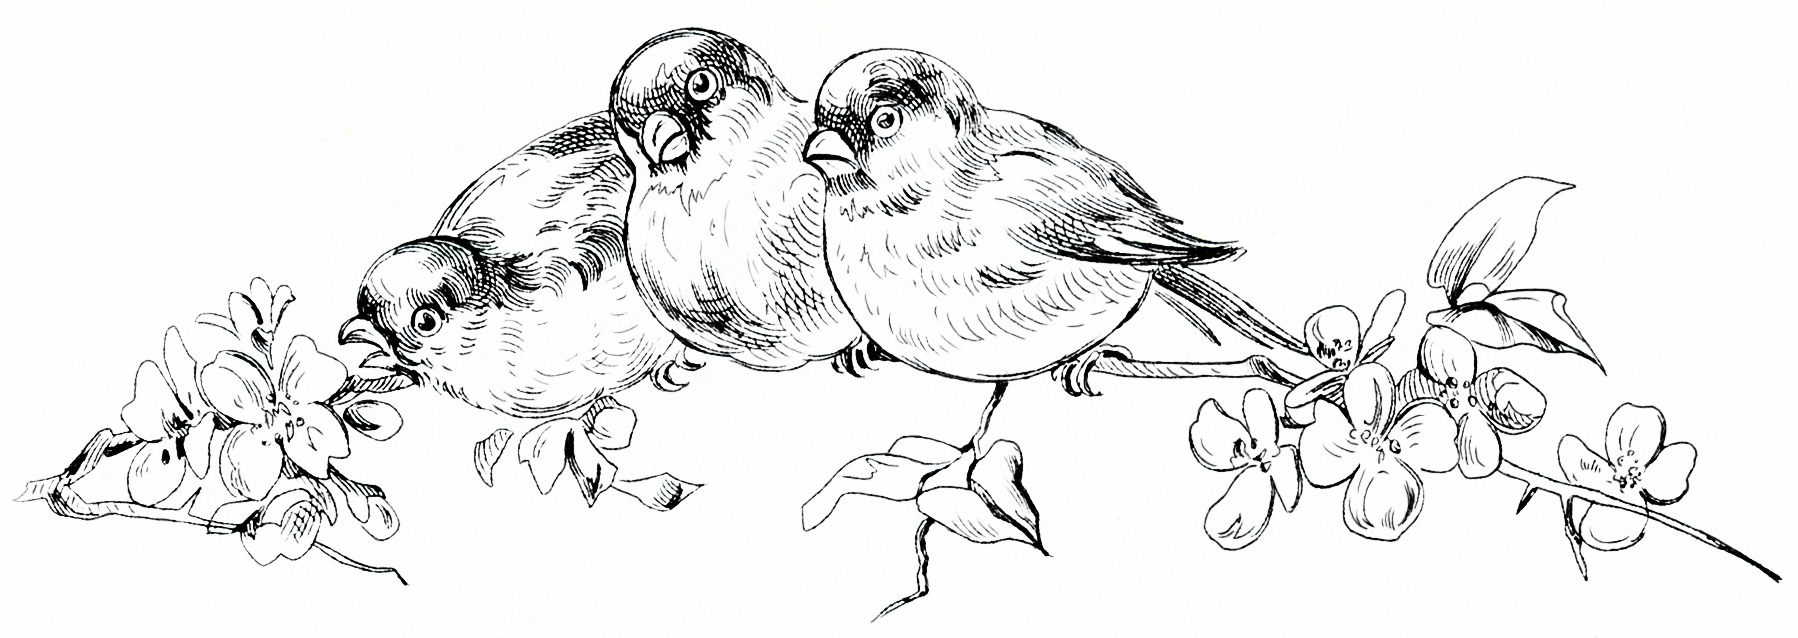 15 Bird Black And White Vintage Design Images